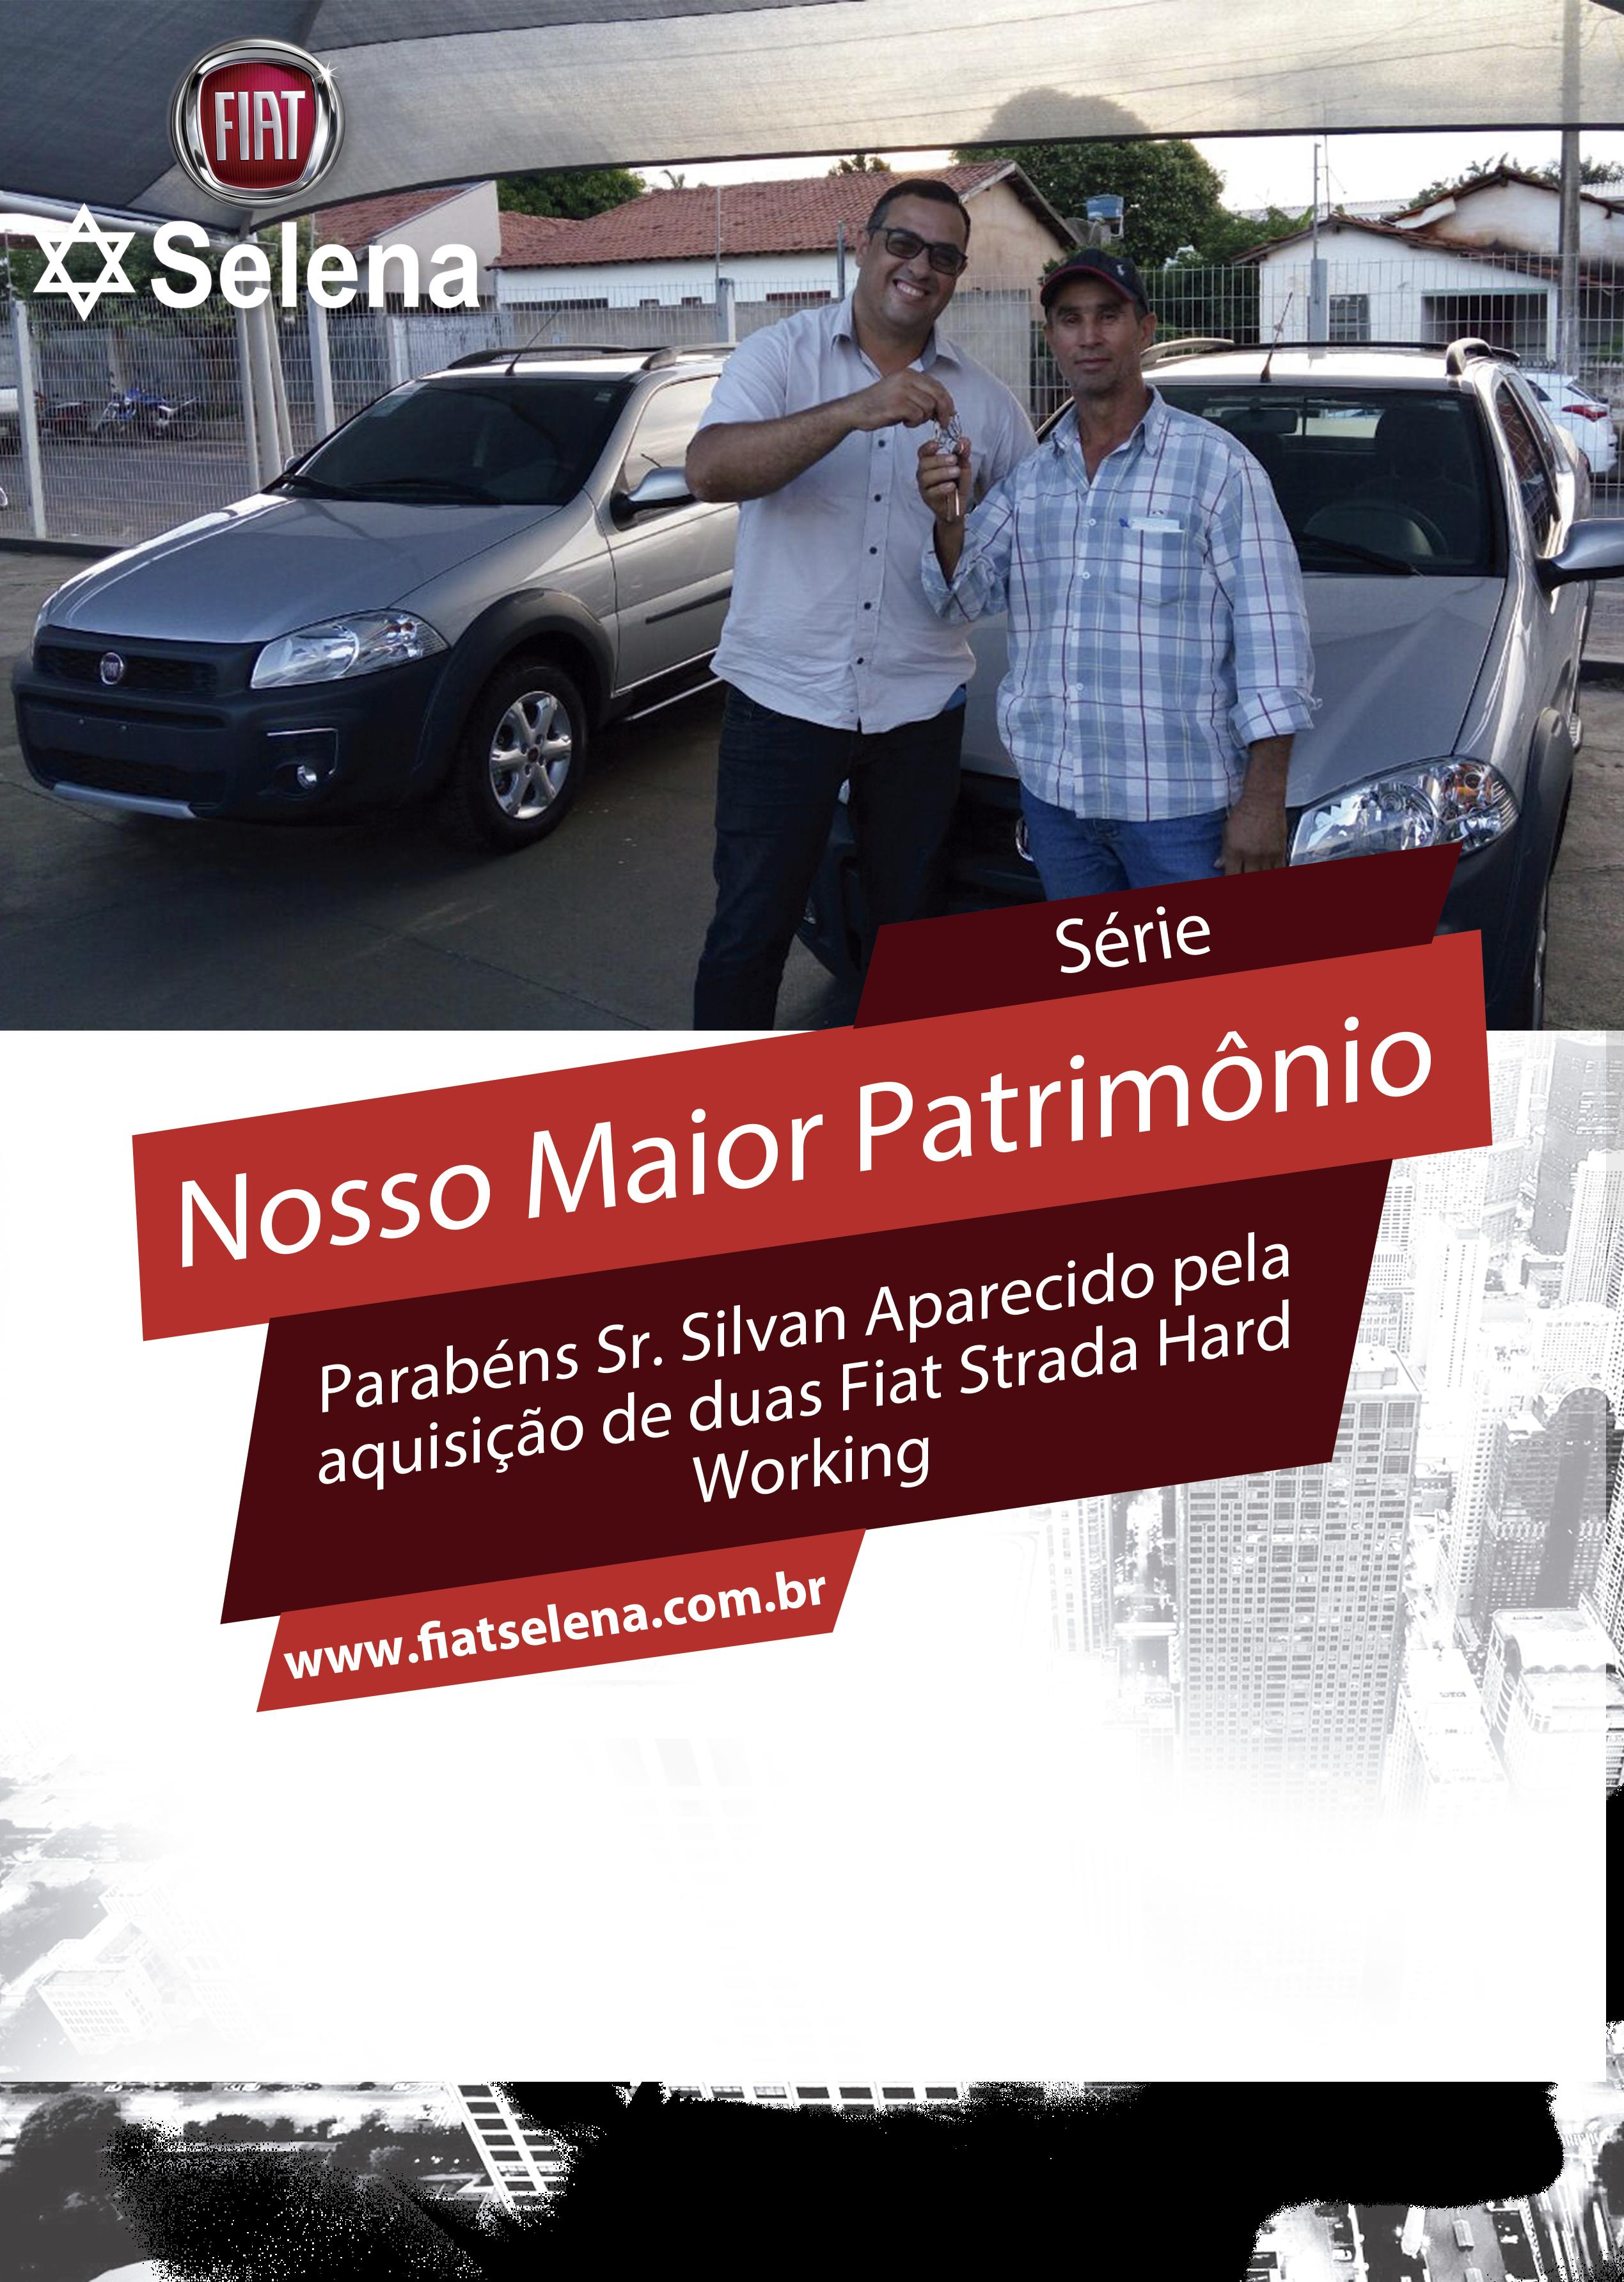 Sr. Silvan Aparecido